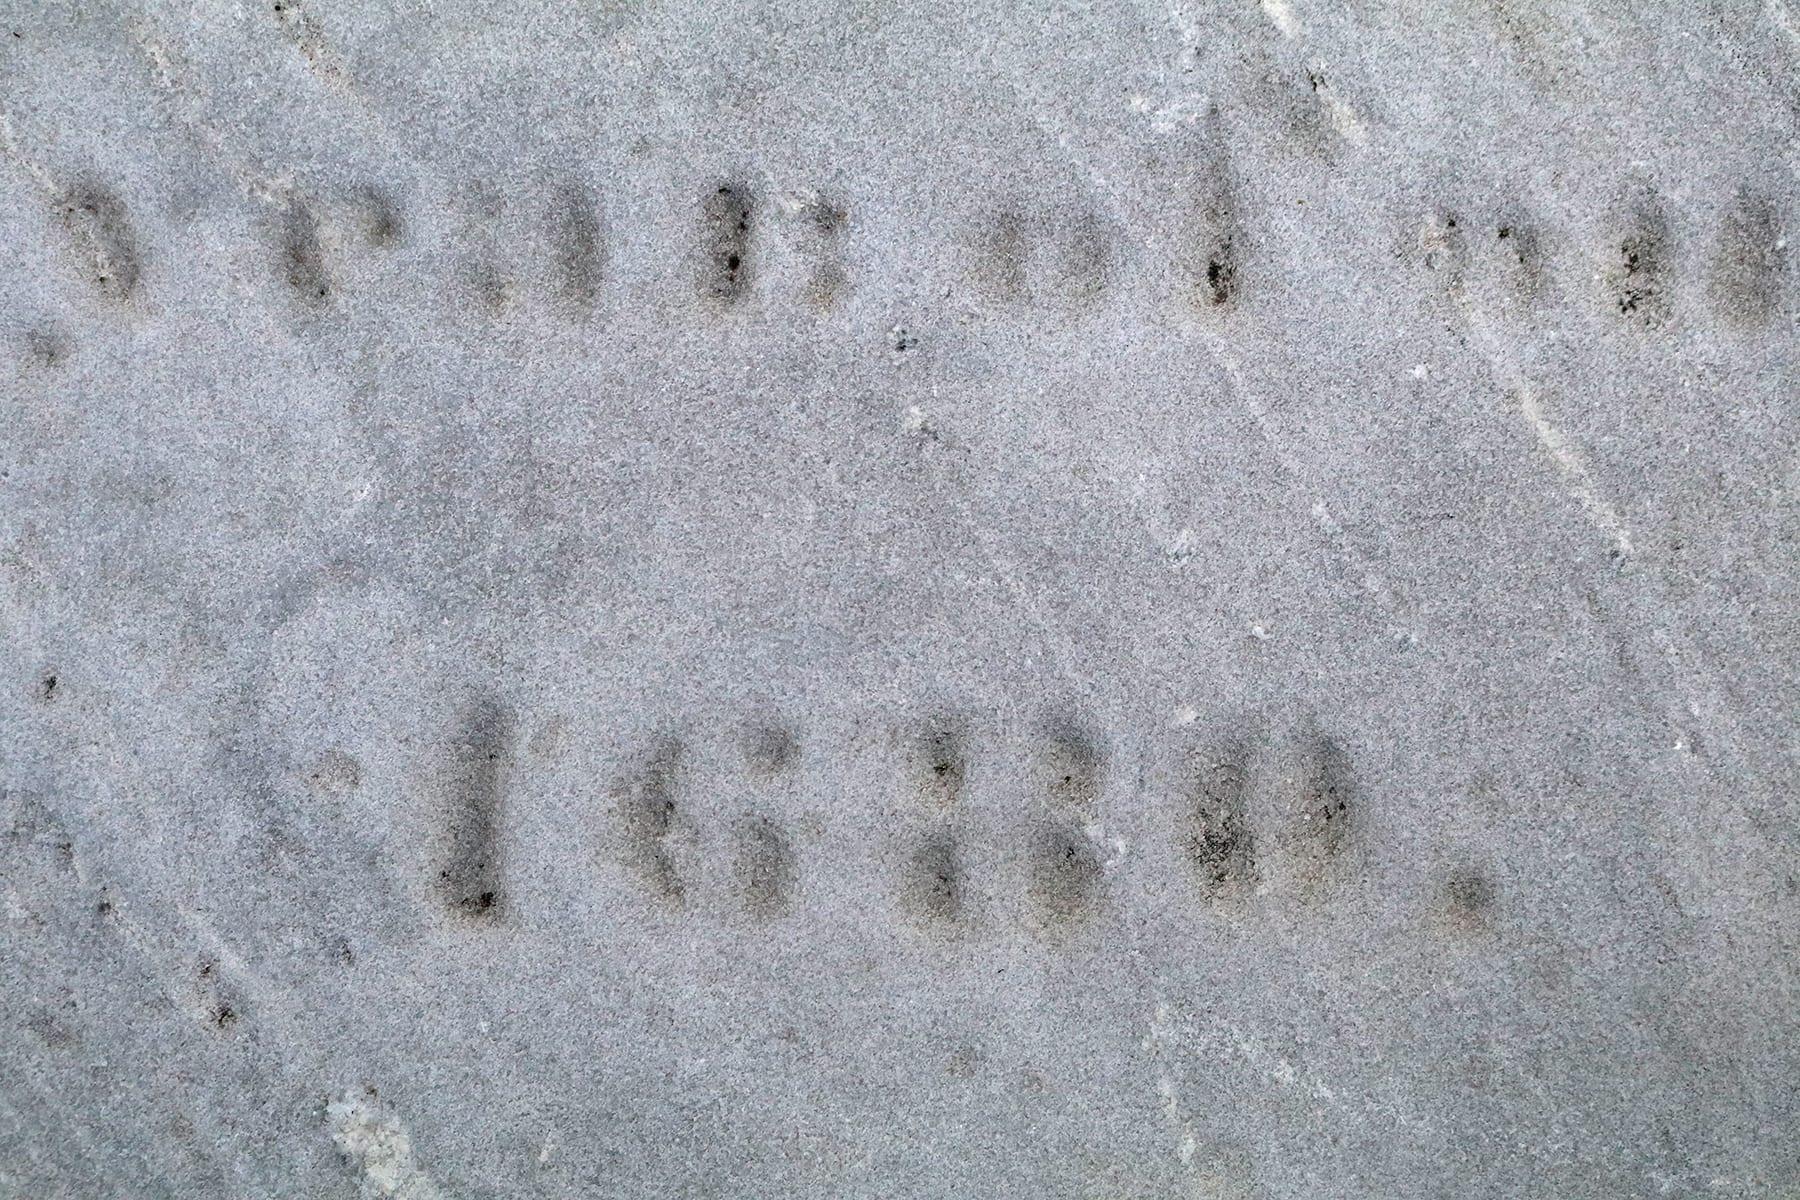 04-MA-journey02-gravesite1680.jpg